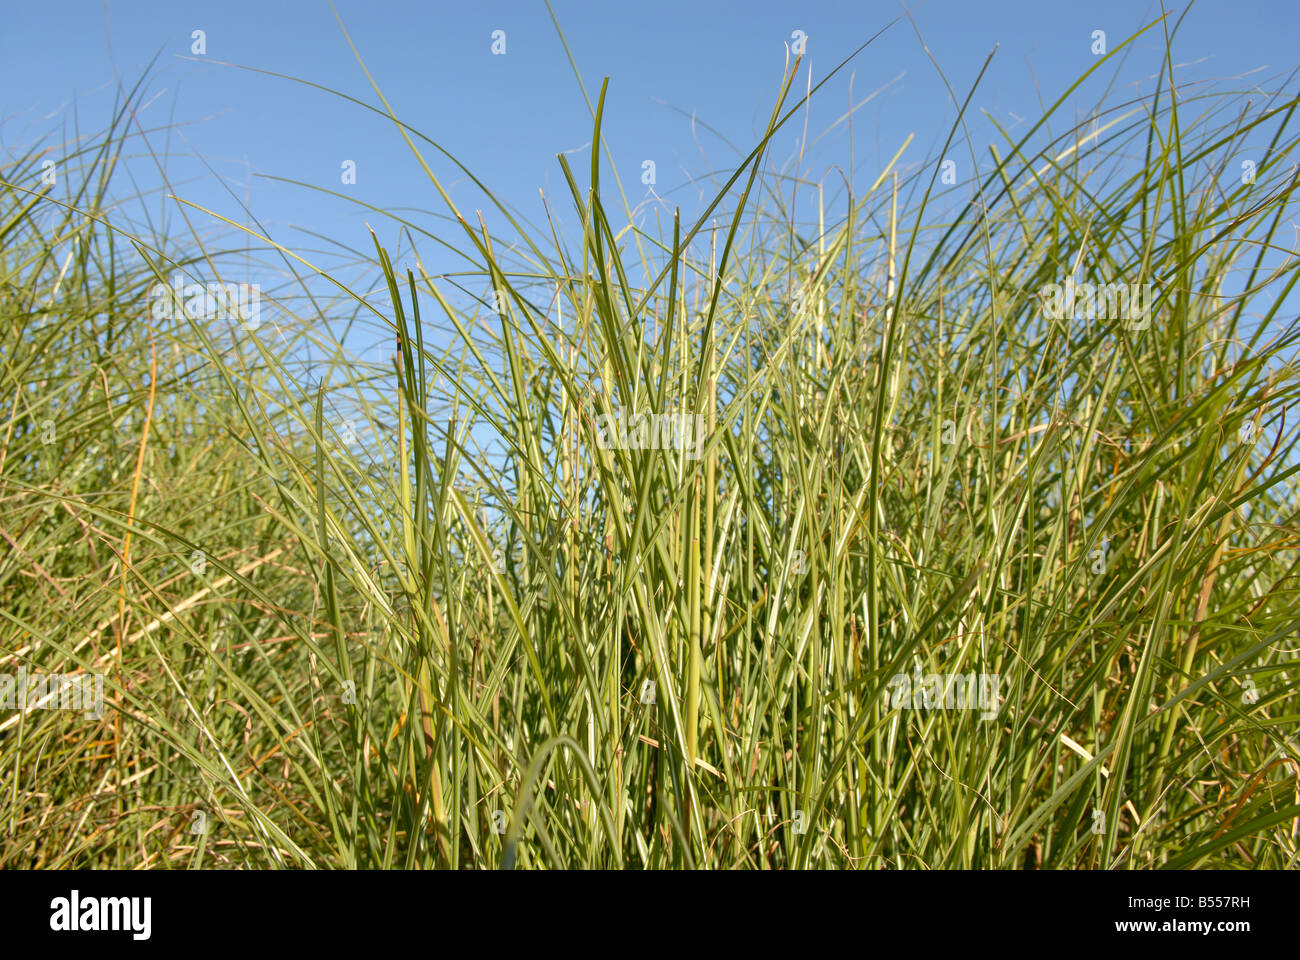 TALL GRASS - Stock Image